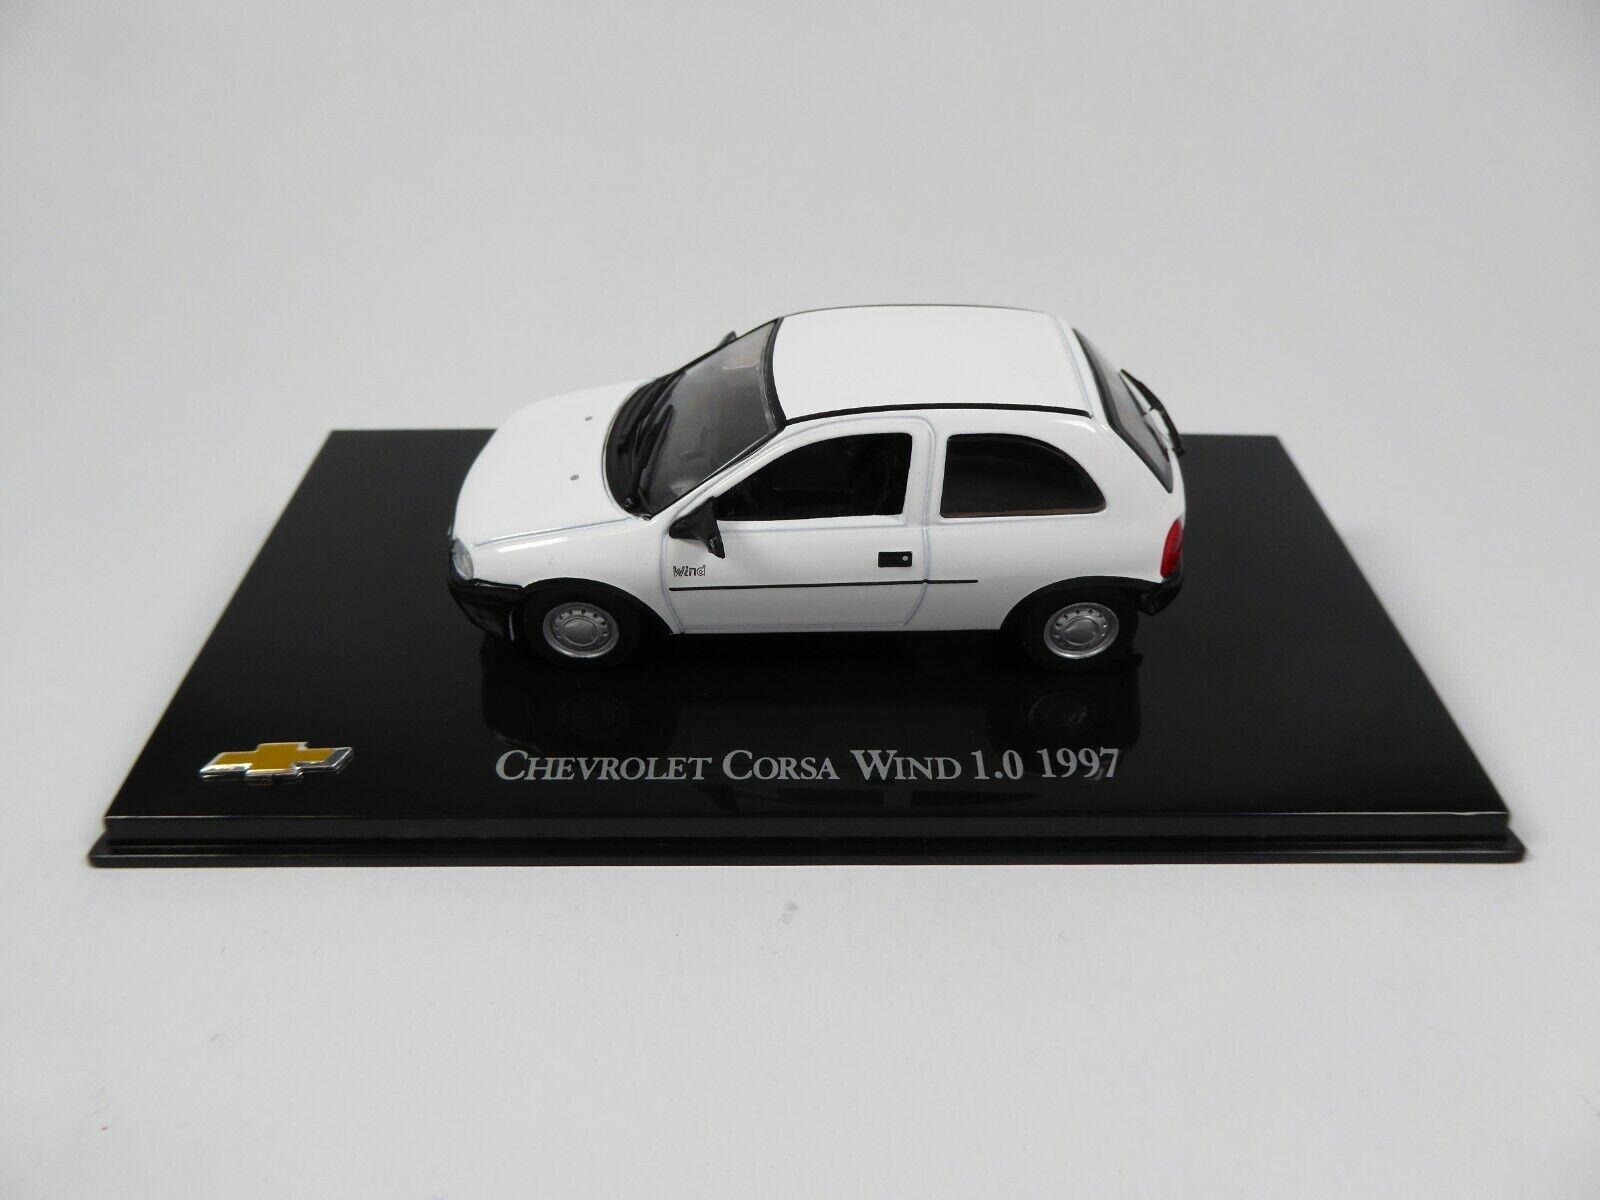 Opel Corsa 1 Sedan 2002-1:43 Diecast Model Car General Motors CH60 Chevrolet